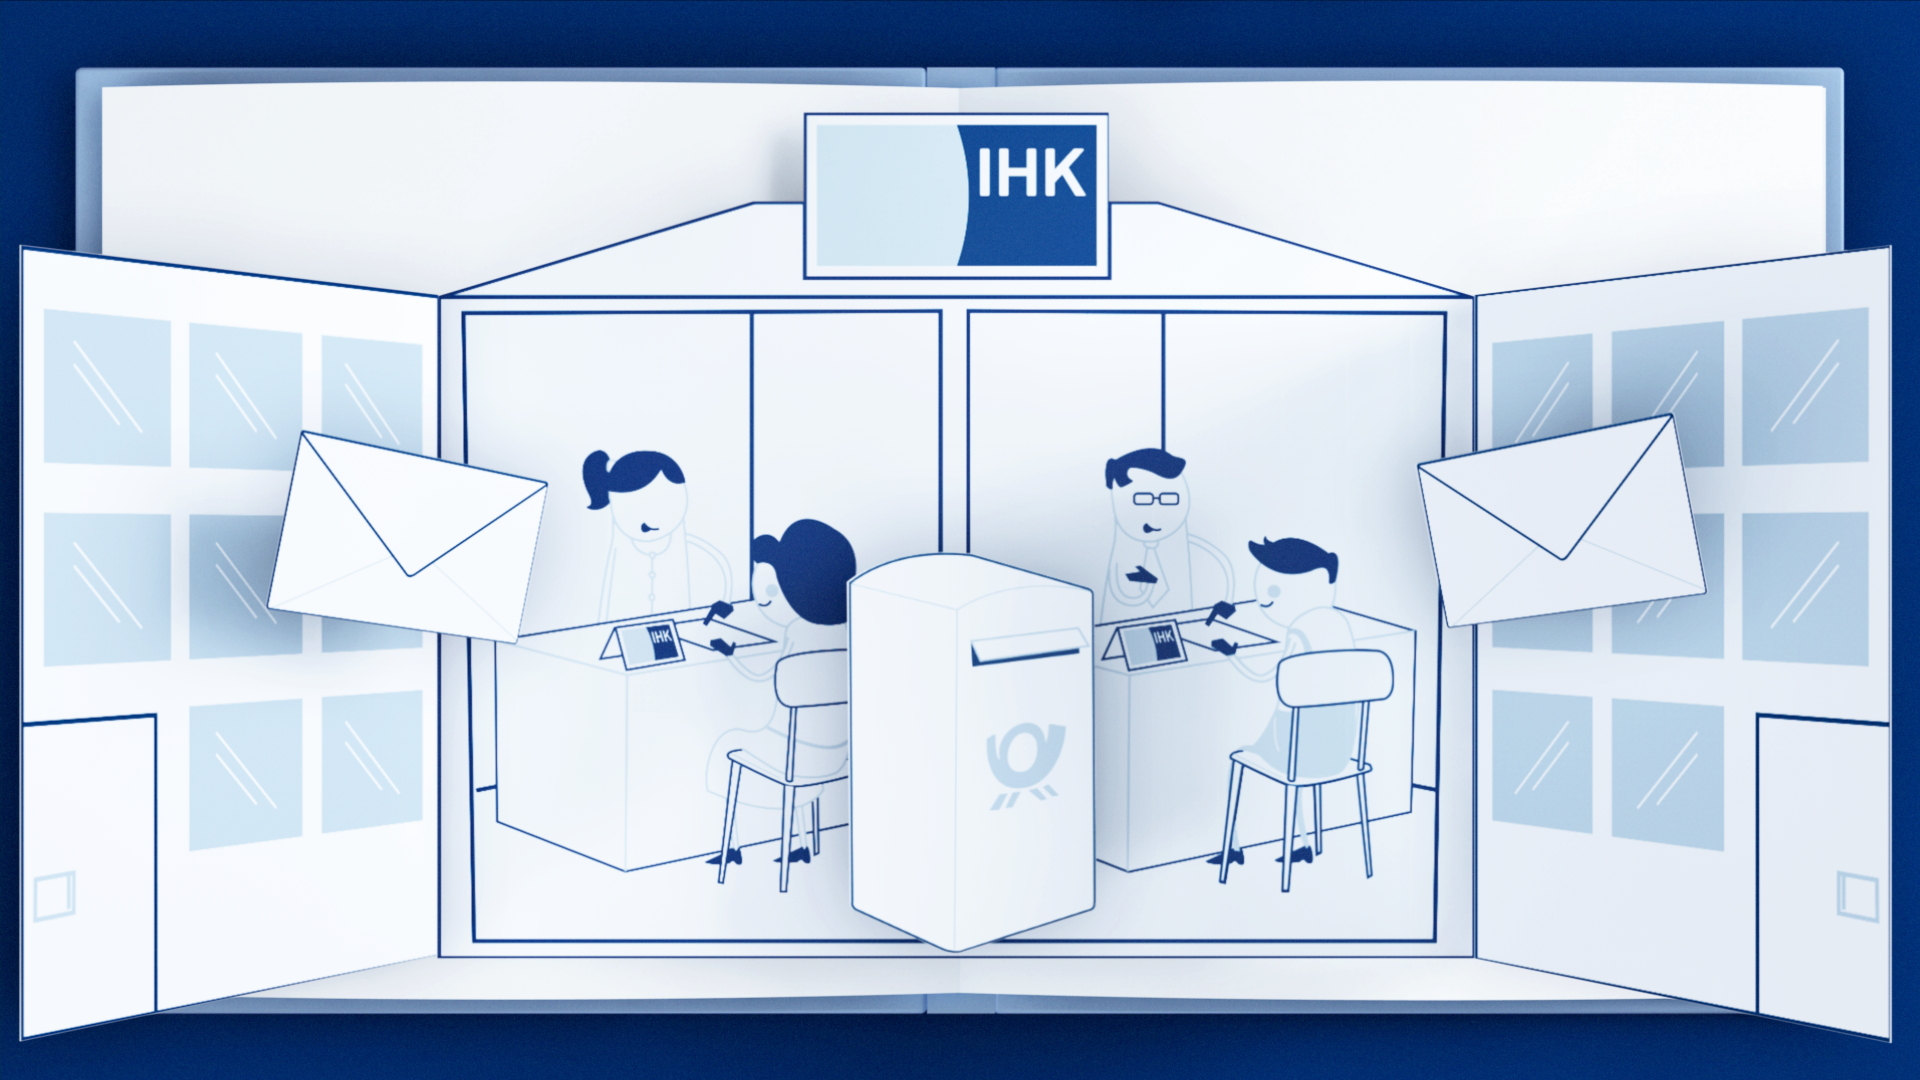 IHK_thumb-1